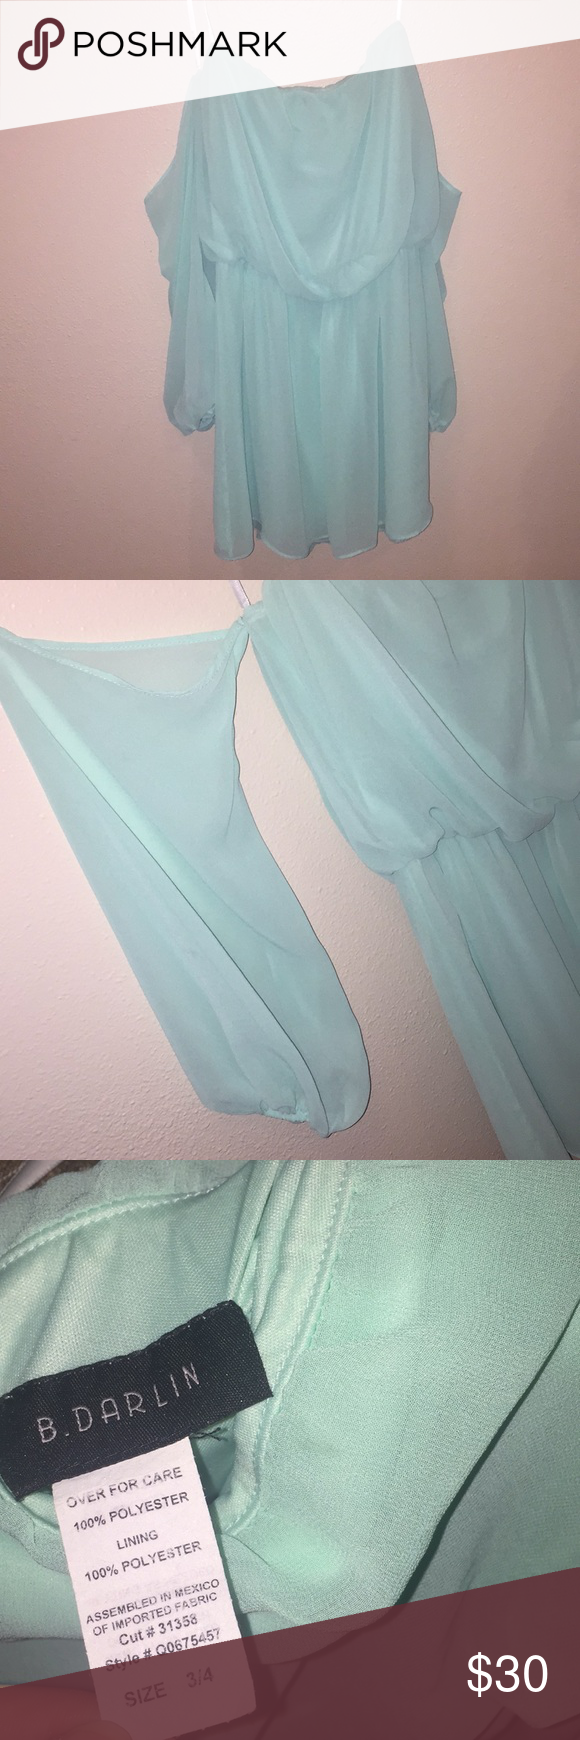 613a7f2b6d73 MINT GREEN OFF SHOULDER SLEEVE DRESS Mint green off shoulder long sleeve  dress. Flowy polyester material. Elastic intake at waist   wrists.